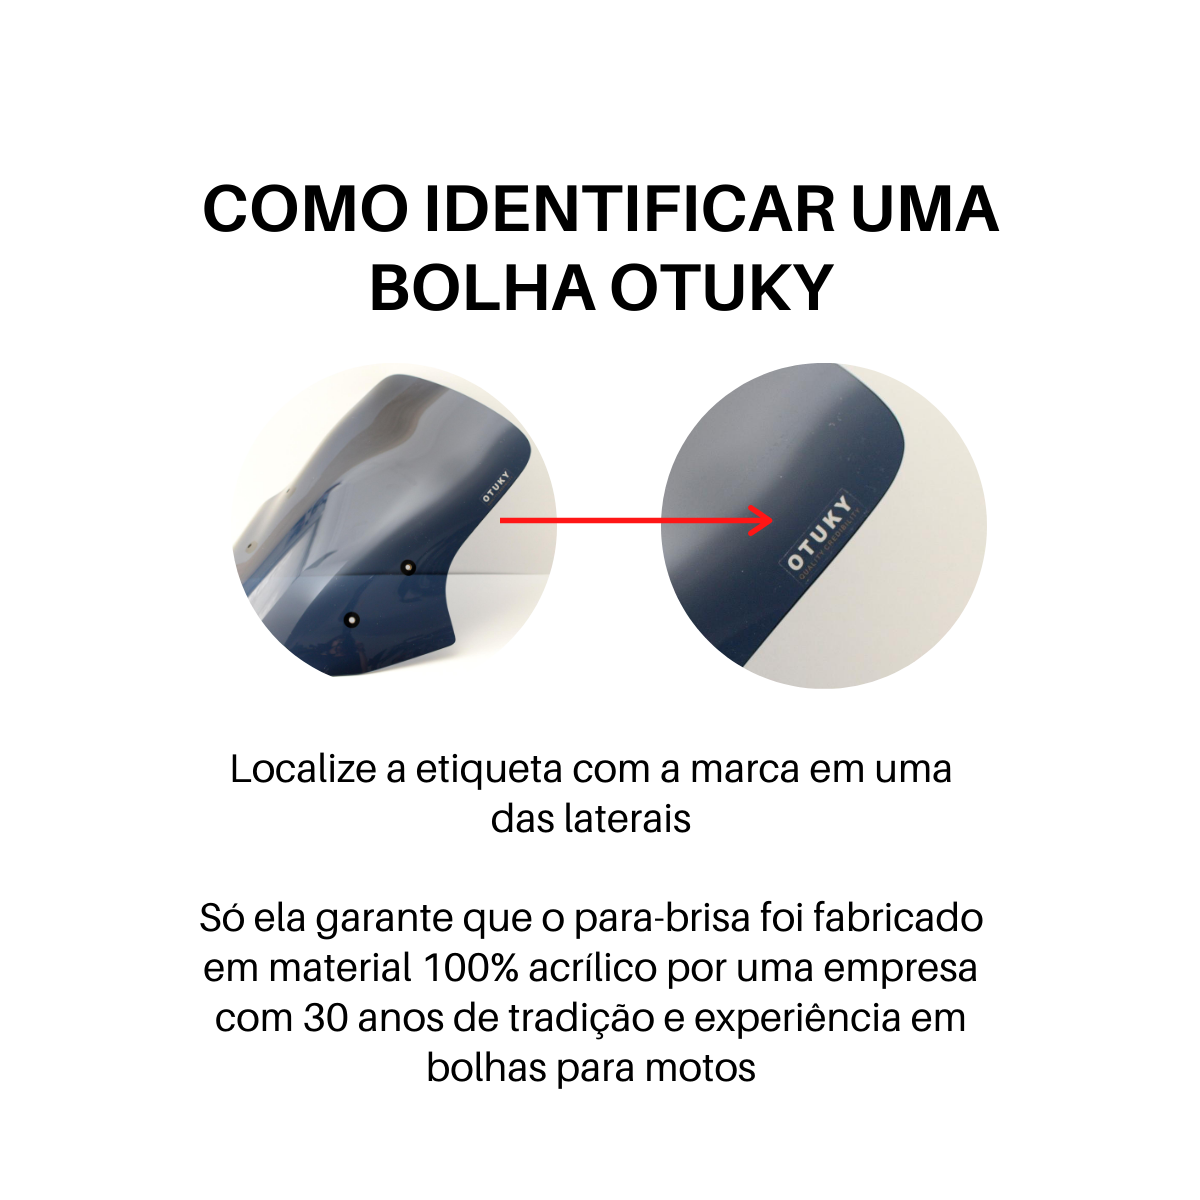 Bolha para Moto NC 700 X Otuky Alongado +15cm Fumê Cinza